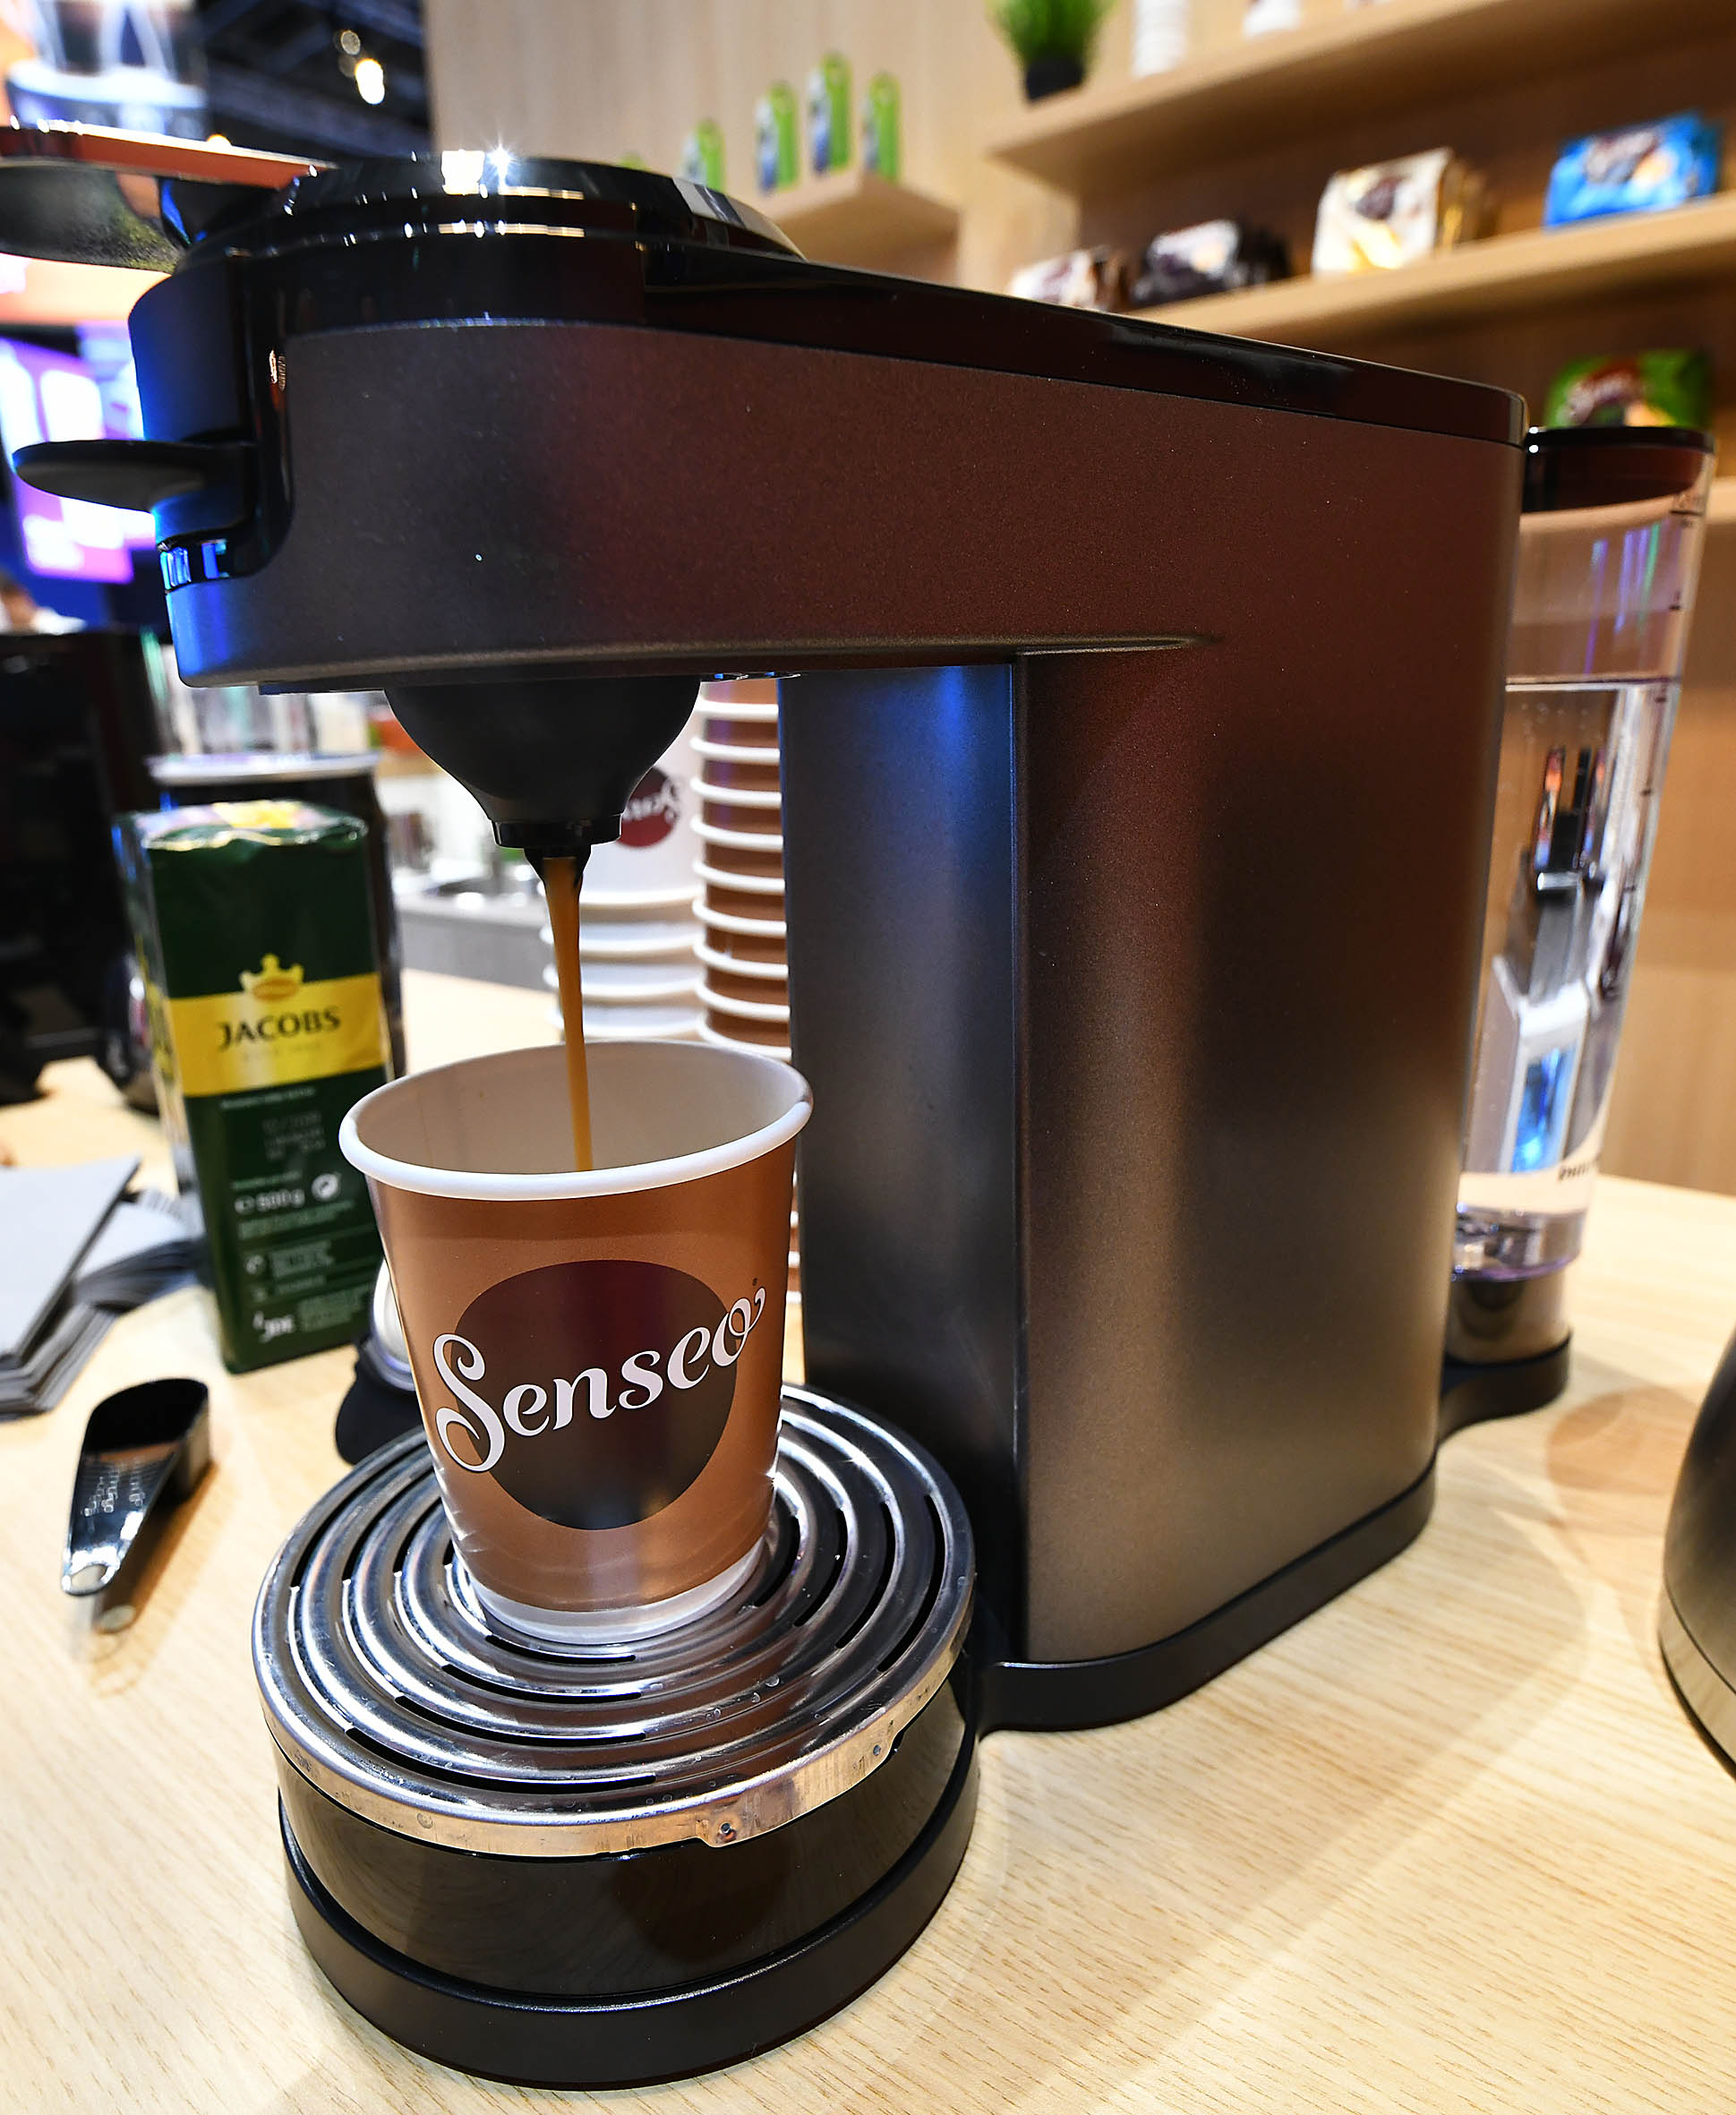 Foto: Michael B. Rehders Kaffeegenuss pur. Senseo aus der Philips-Kaffeemaschine.